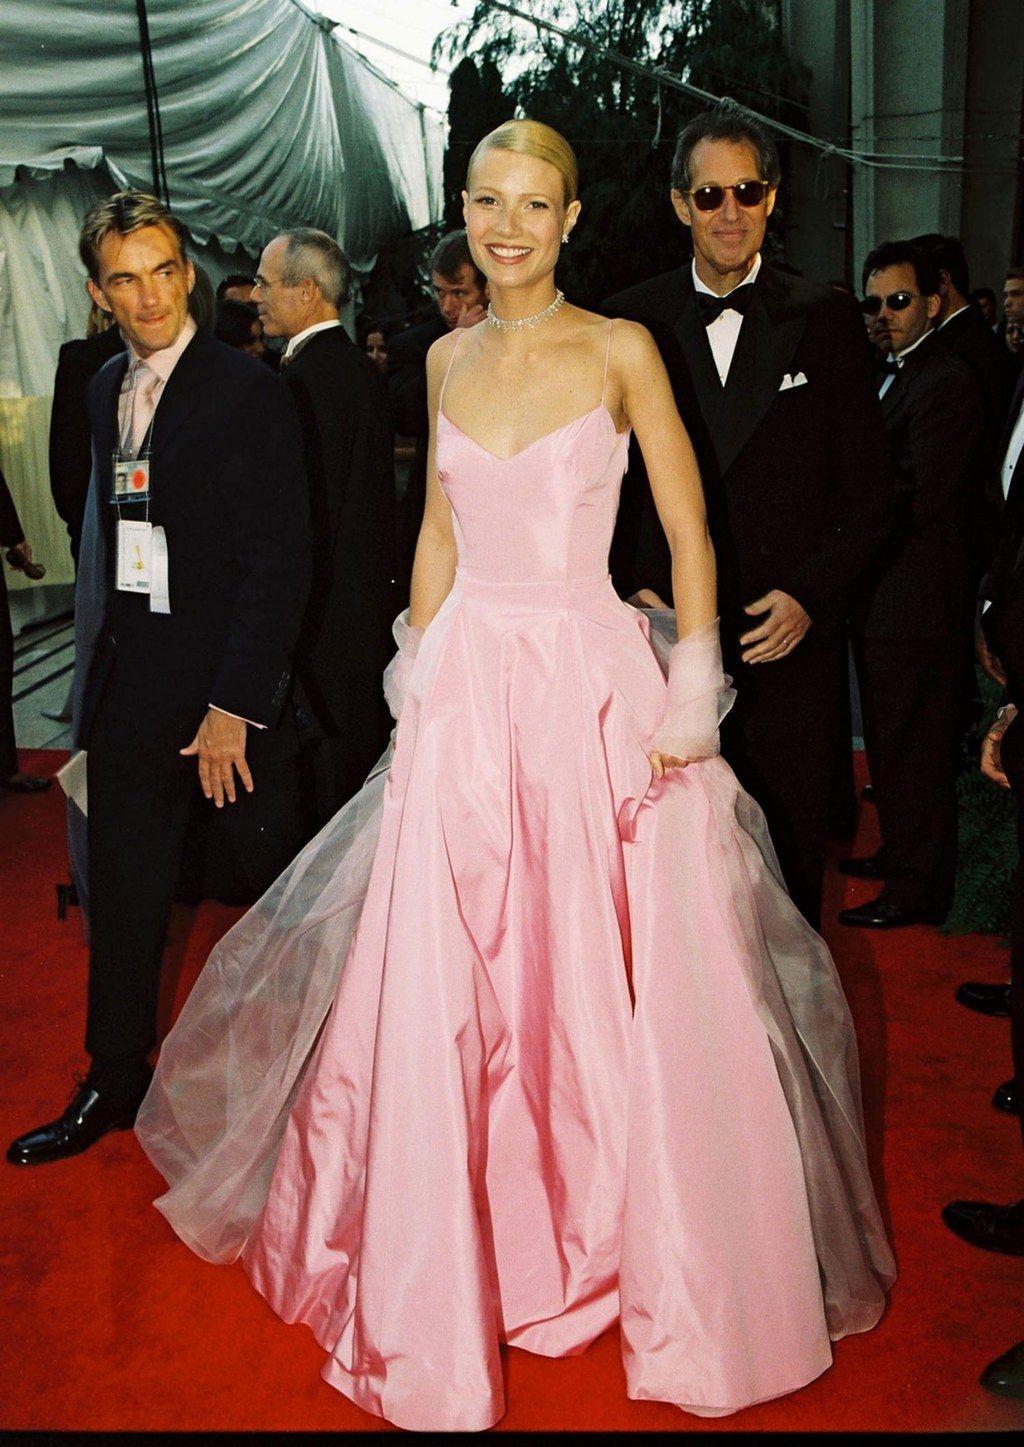 Gwyneth Paltrow Has Some Pretty Interesting Plans for Her Old Oscar ...